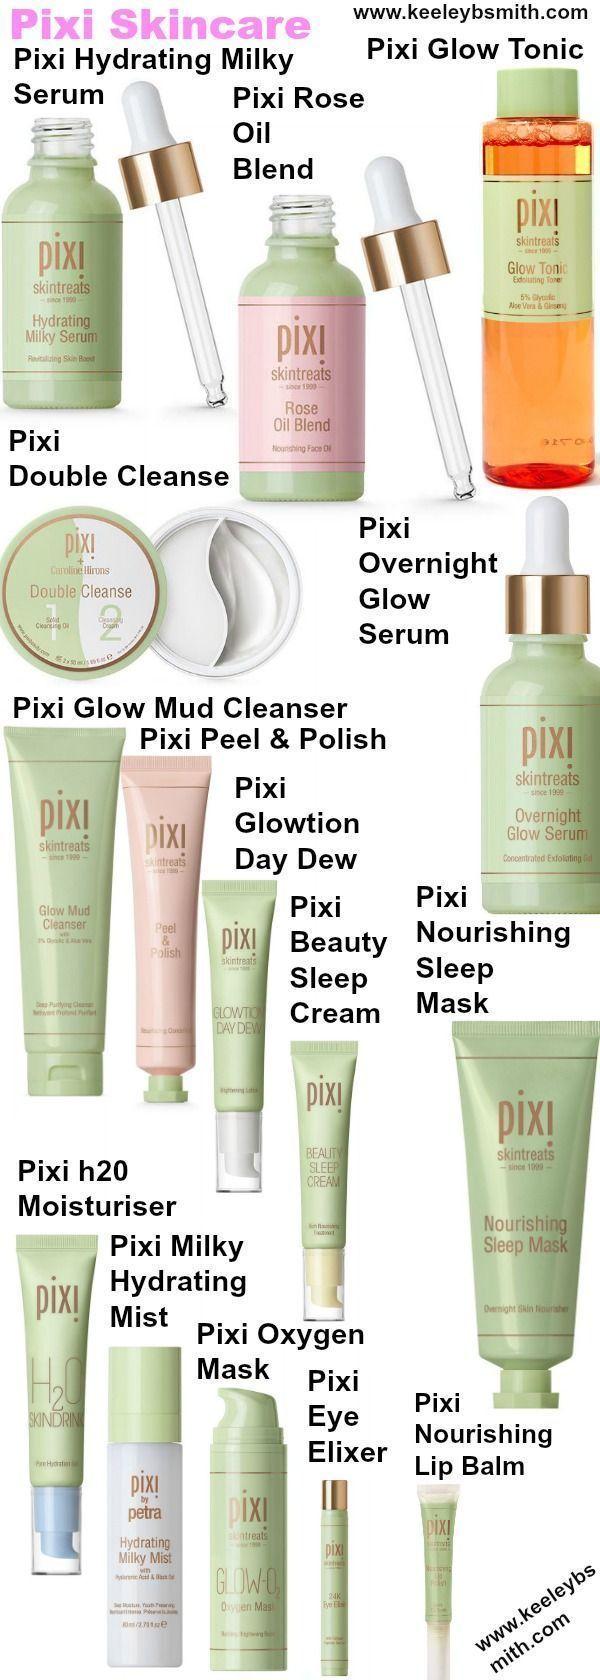 Pixi Hautpflegeprodukte #propernailcare